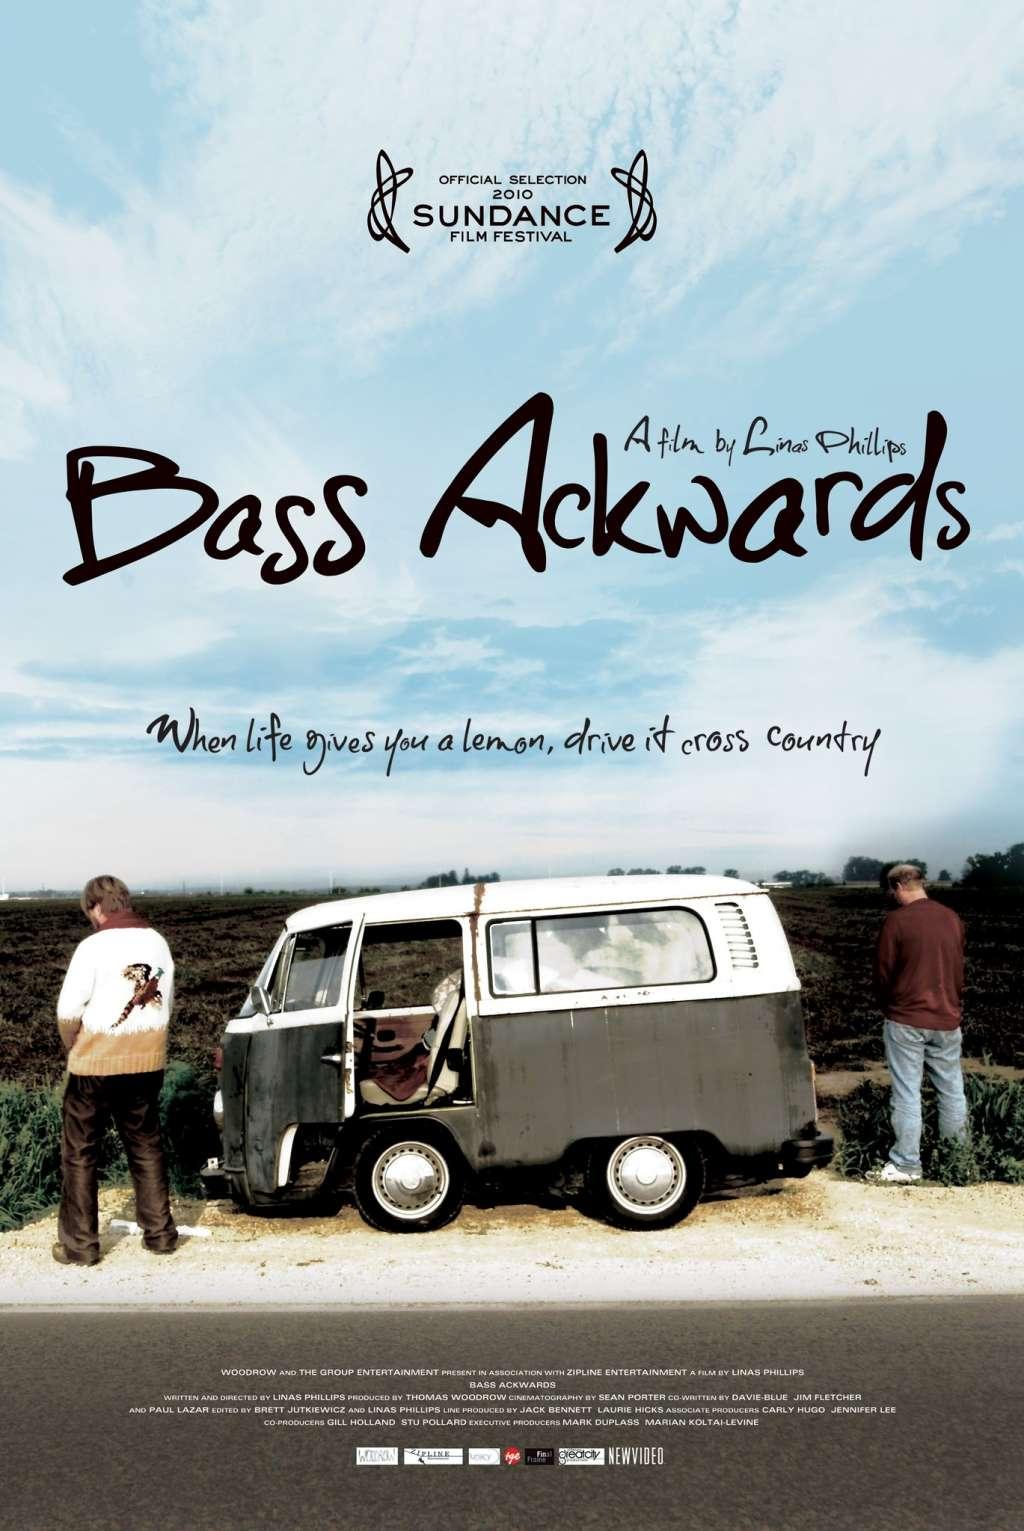 Bass Ackwards kapak